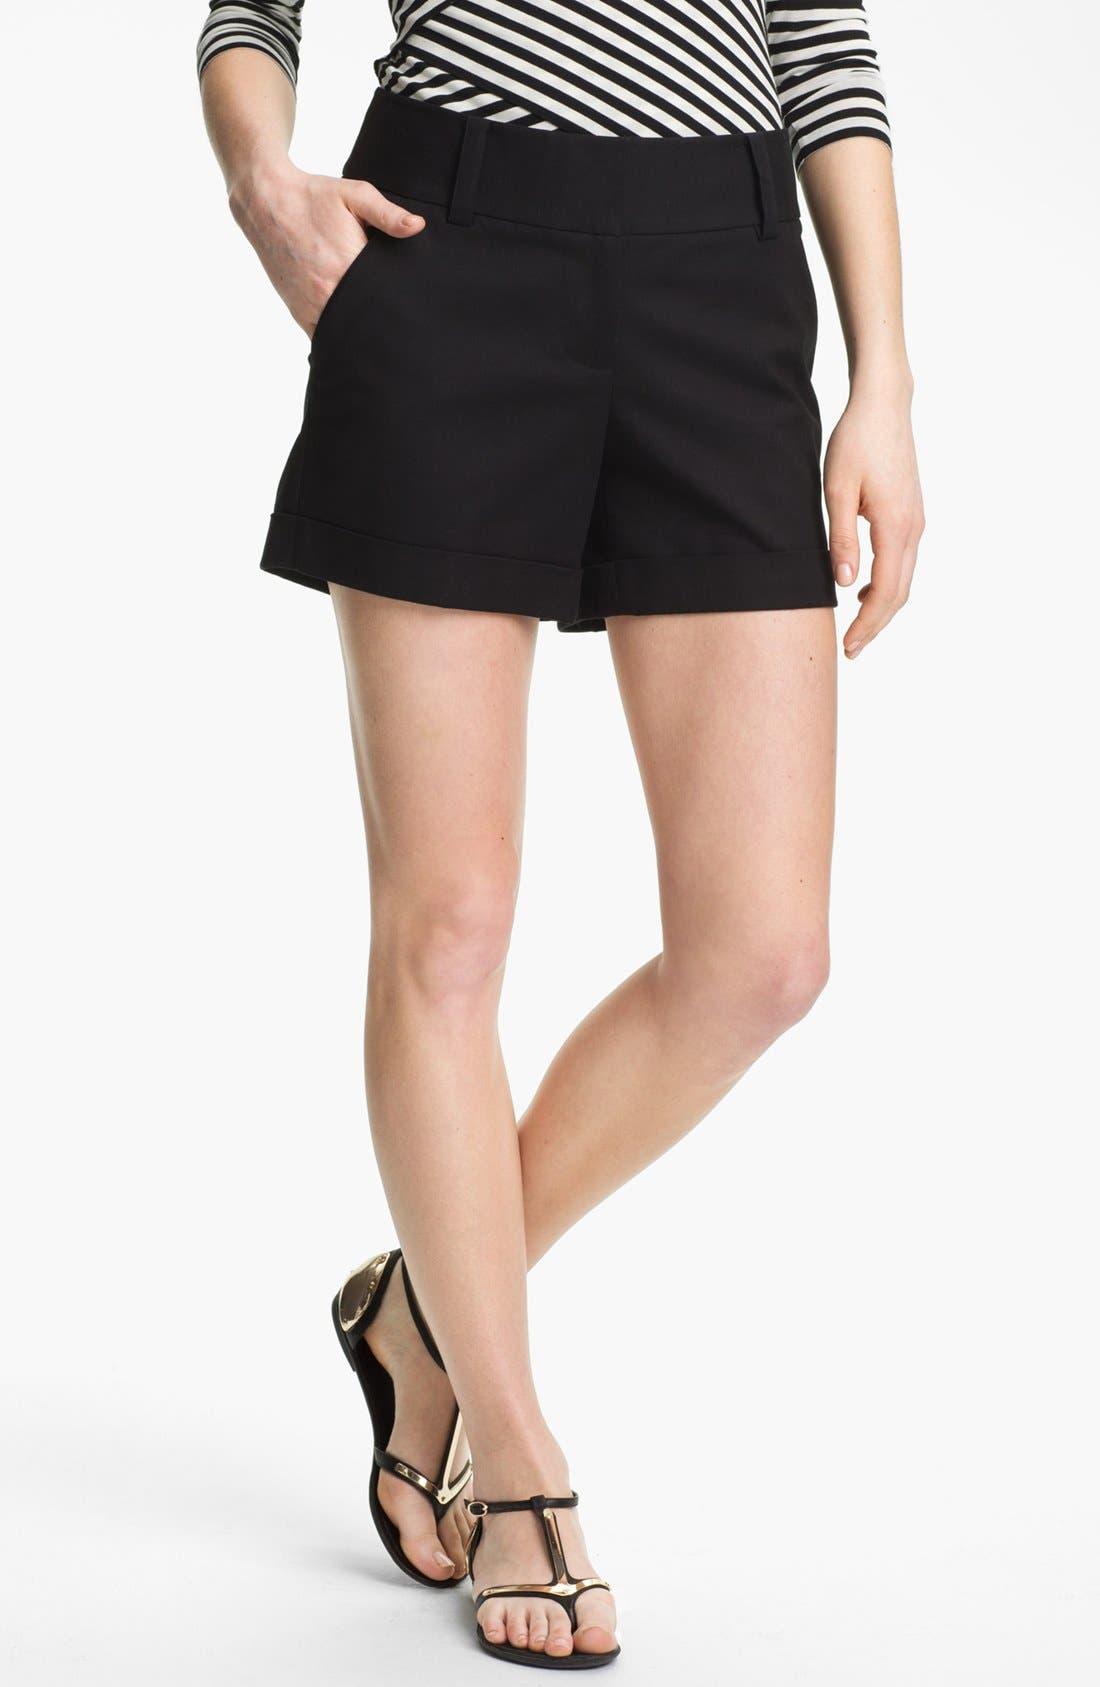 Alternate Image 1 Selected - Vince Camuto Cuff Shorts (Regular & Petite)